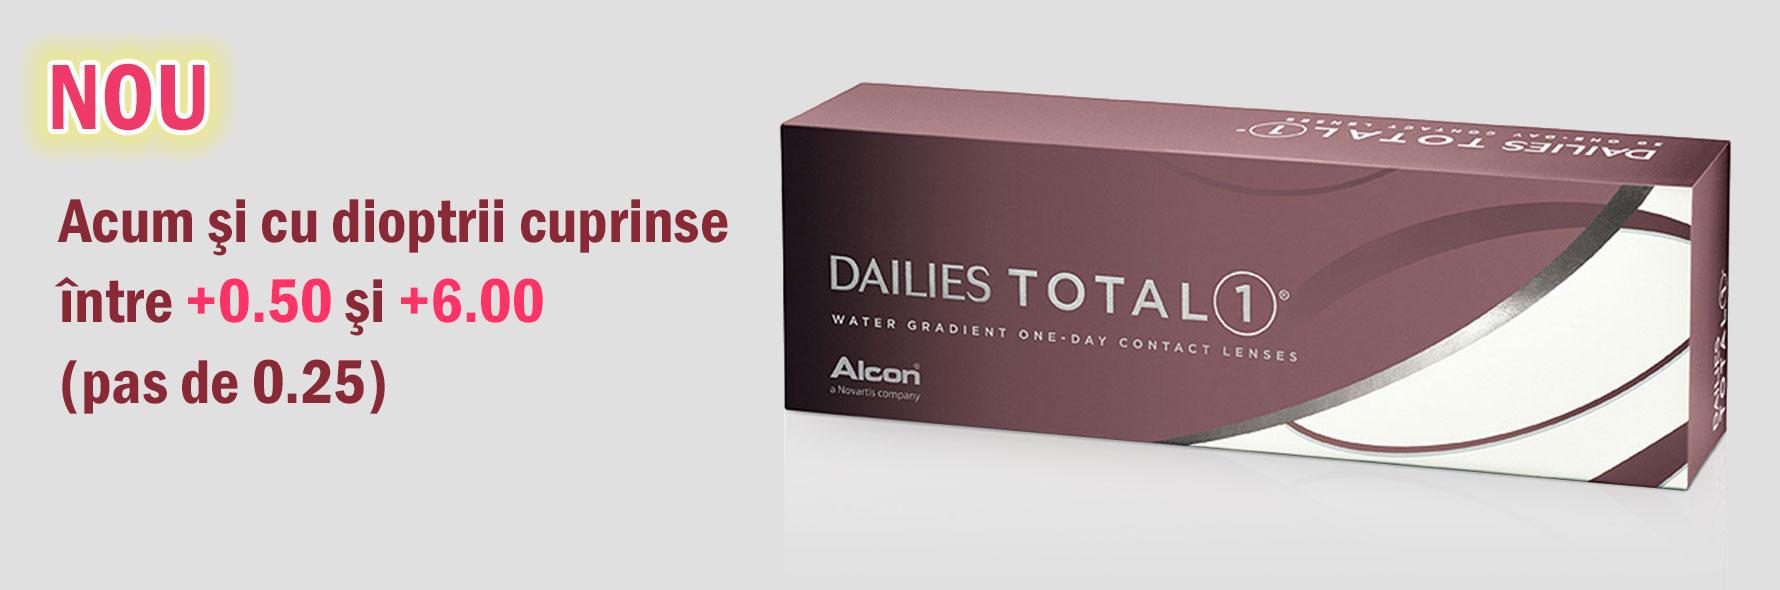 DAILIES TOTAL1® cu dioptrii pe plus